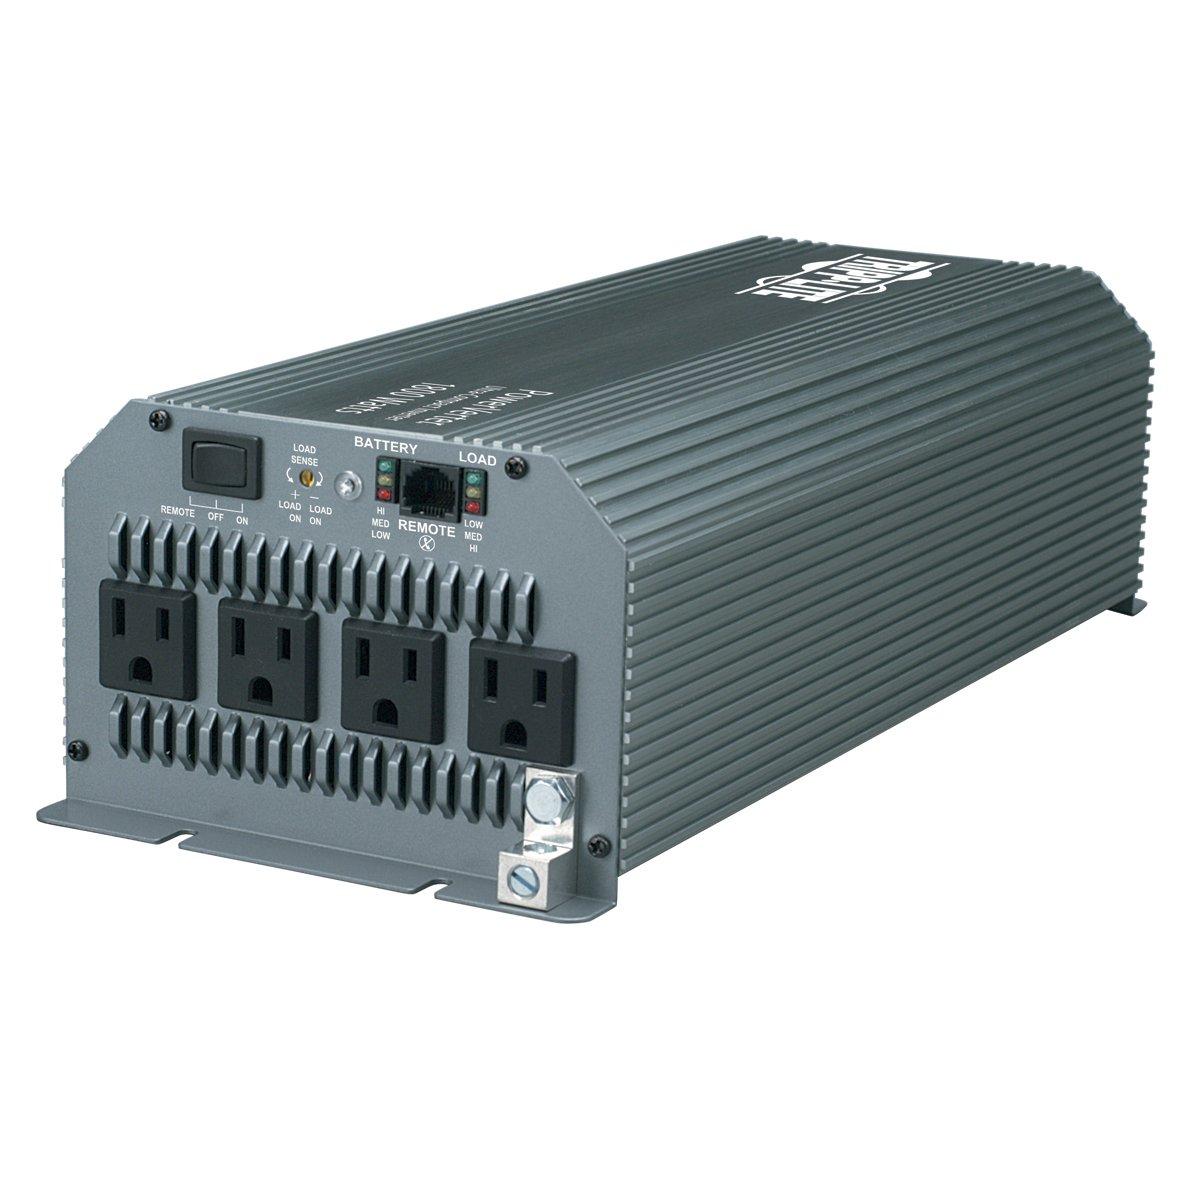 Tripp Lite Power Compact Inverter, 1800W, 12VDC, 120V, 5-15R, 4 Outlets for Automobiles, RVs, Trucks, Fleet Vehicles & Emergency Vehicles  (PV1800HF) by Tripp Lite (Image #1)